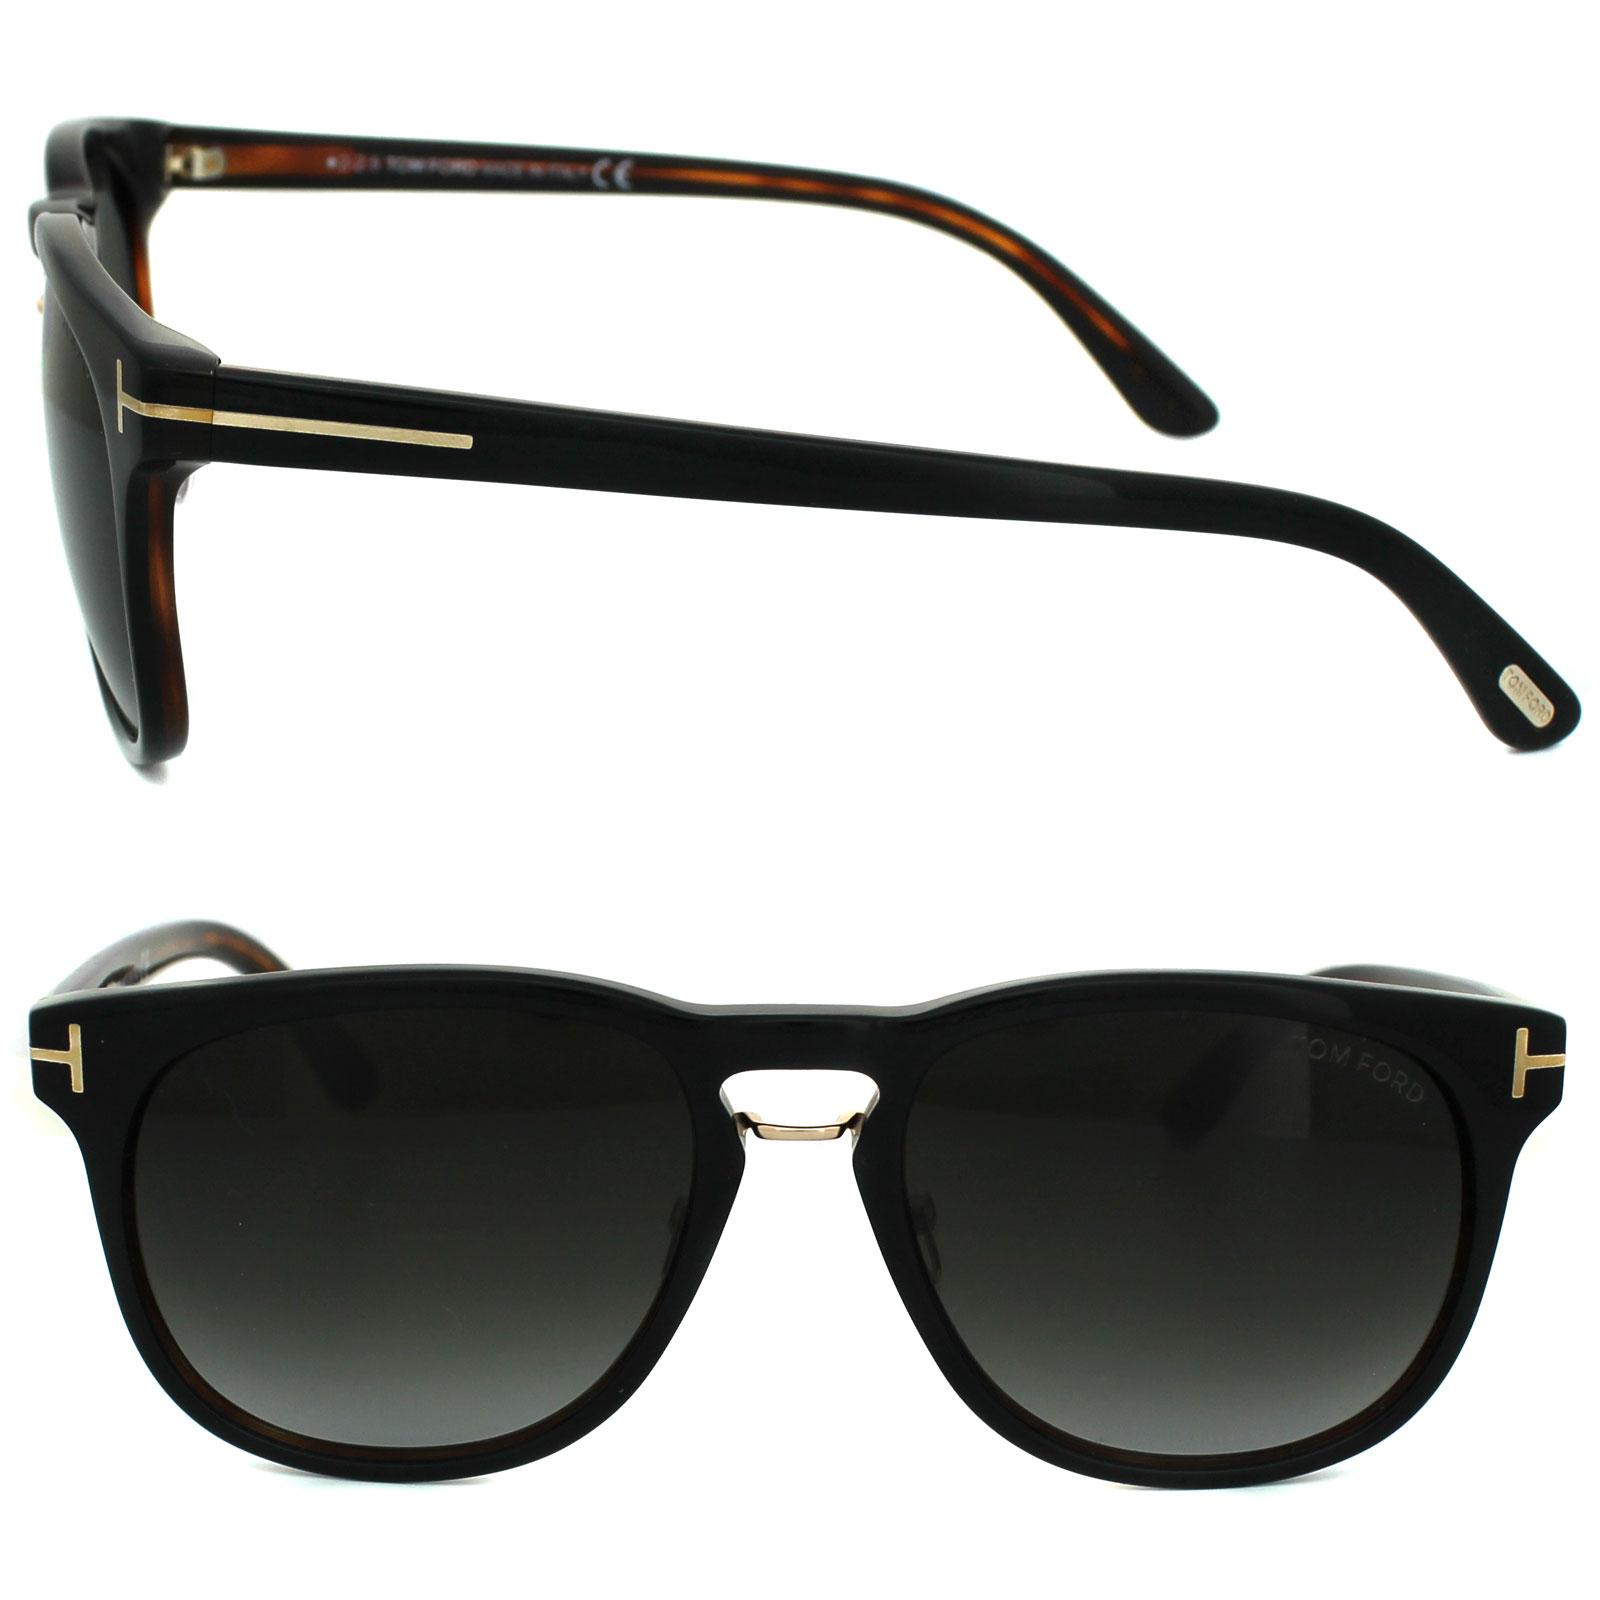 Tom Ford Sunglasses 0346 Franklin 01V Shiny Black Blue